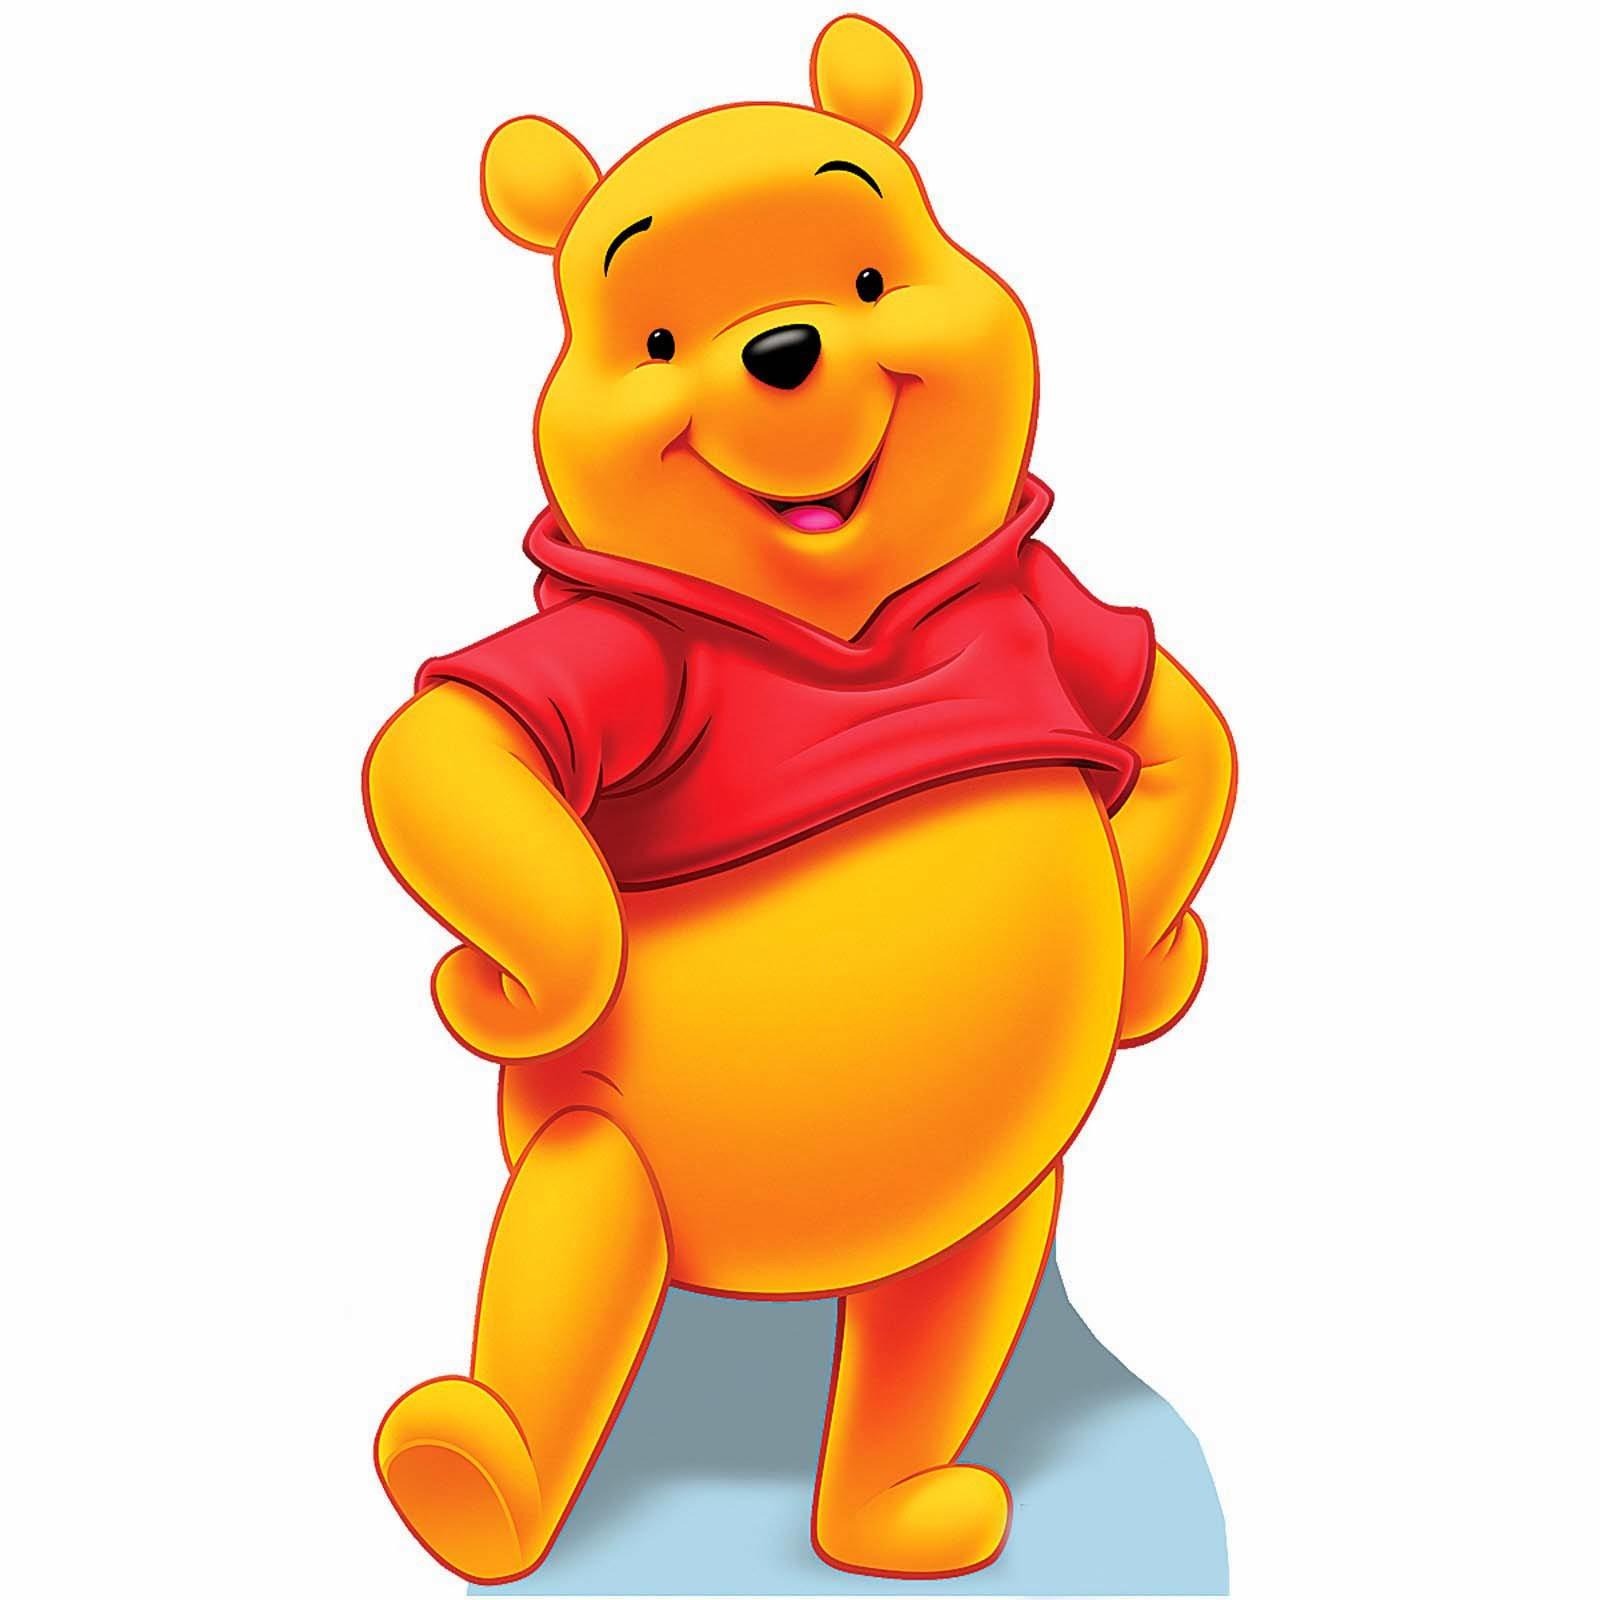 Mewarnai Gambar Winnie The Pooh